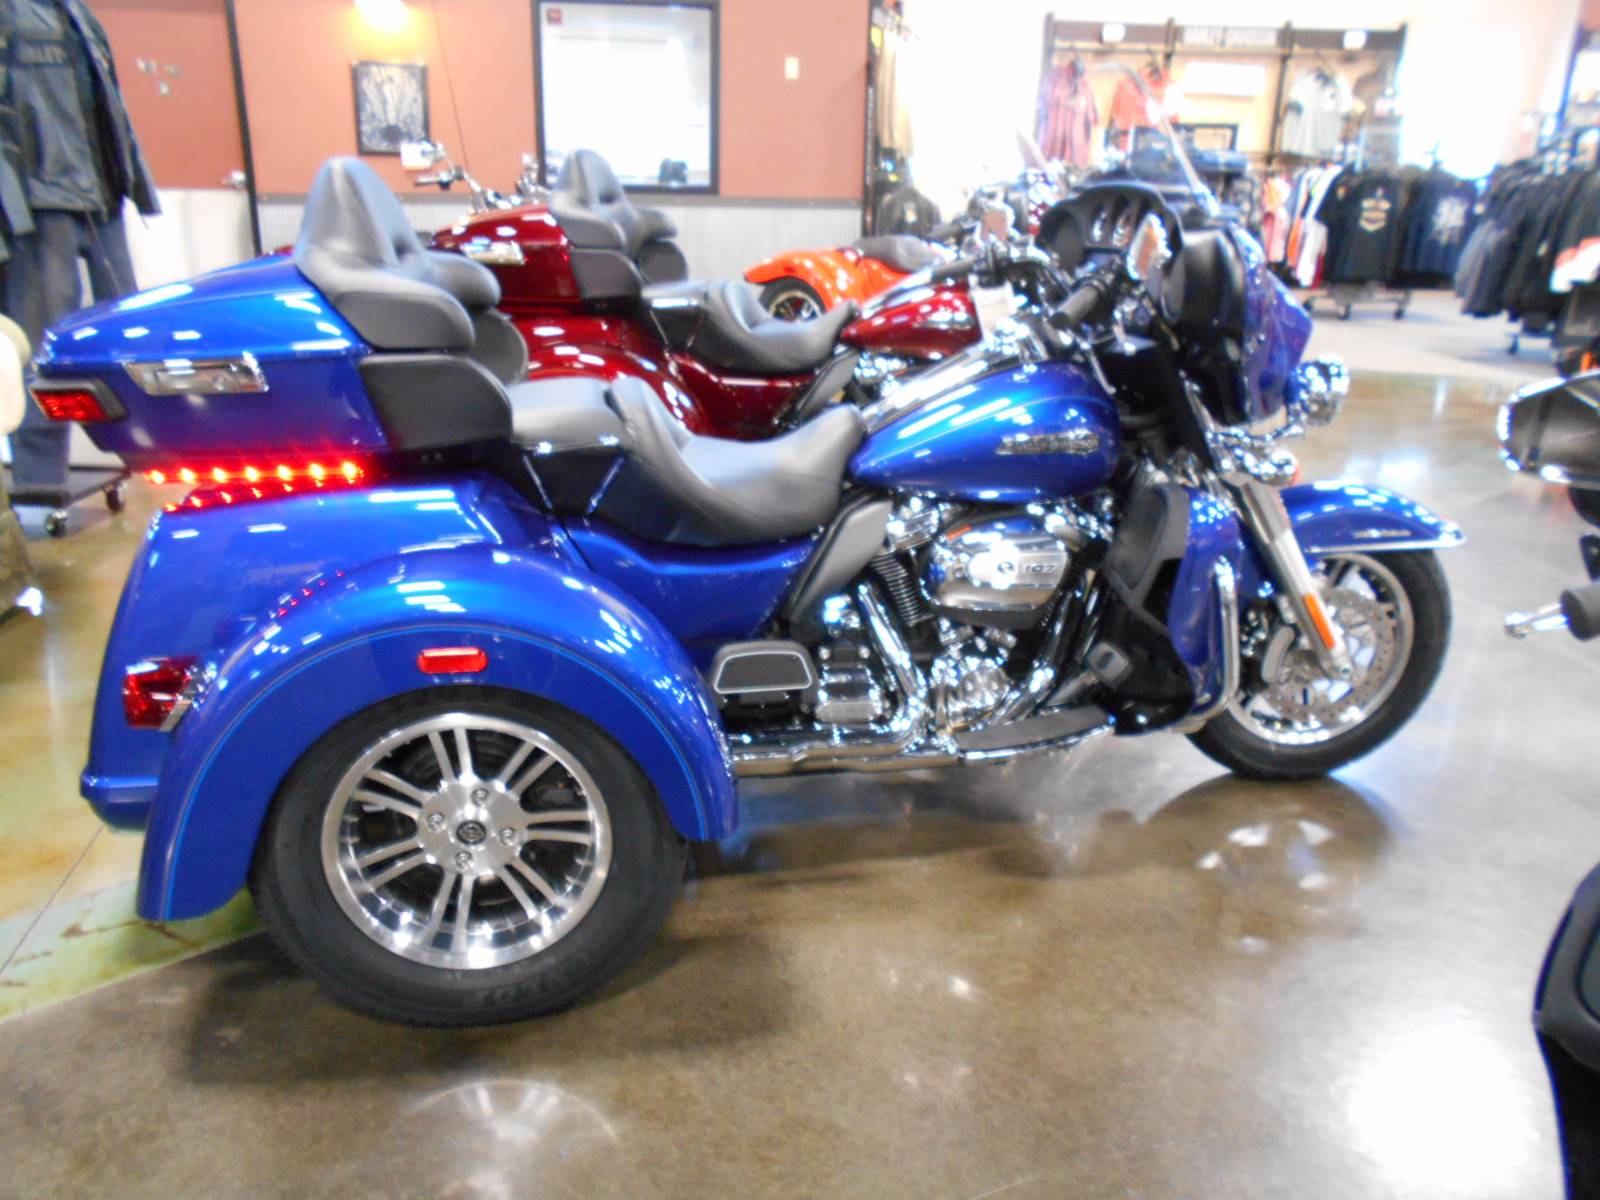 new bike inventory for sale | reel brothers harley-davidson